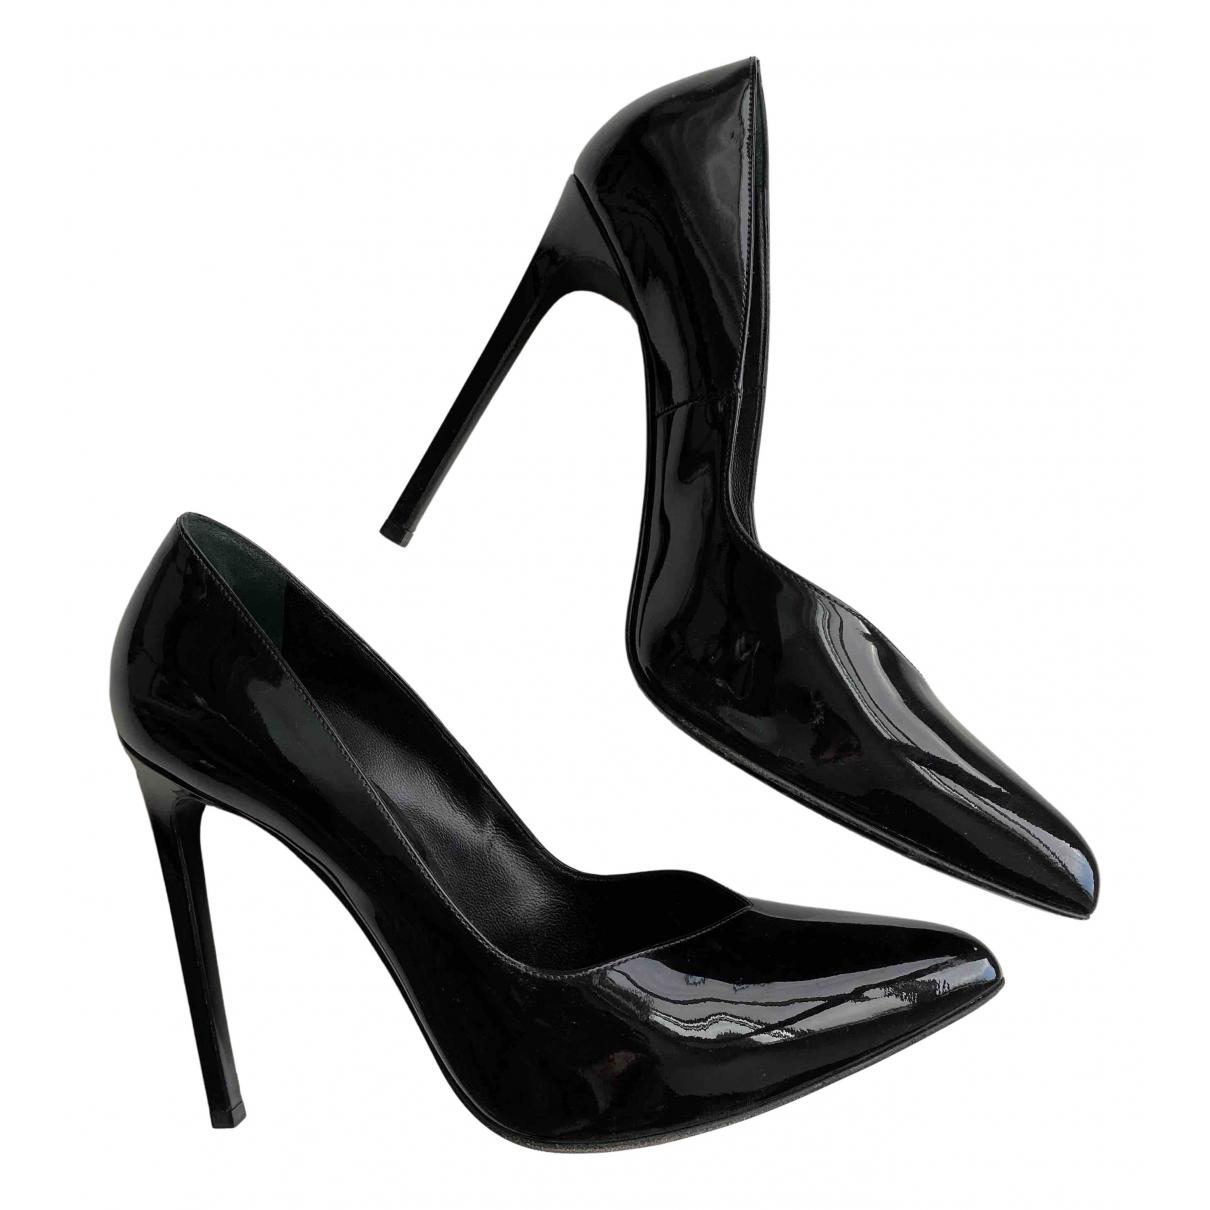 Saint Laurent \N Black Patent leather Heels for Women 39 EU